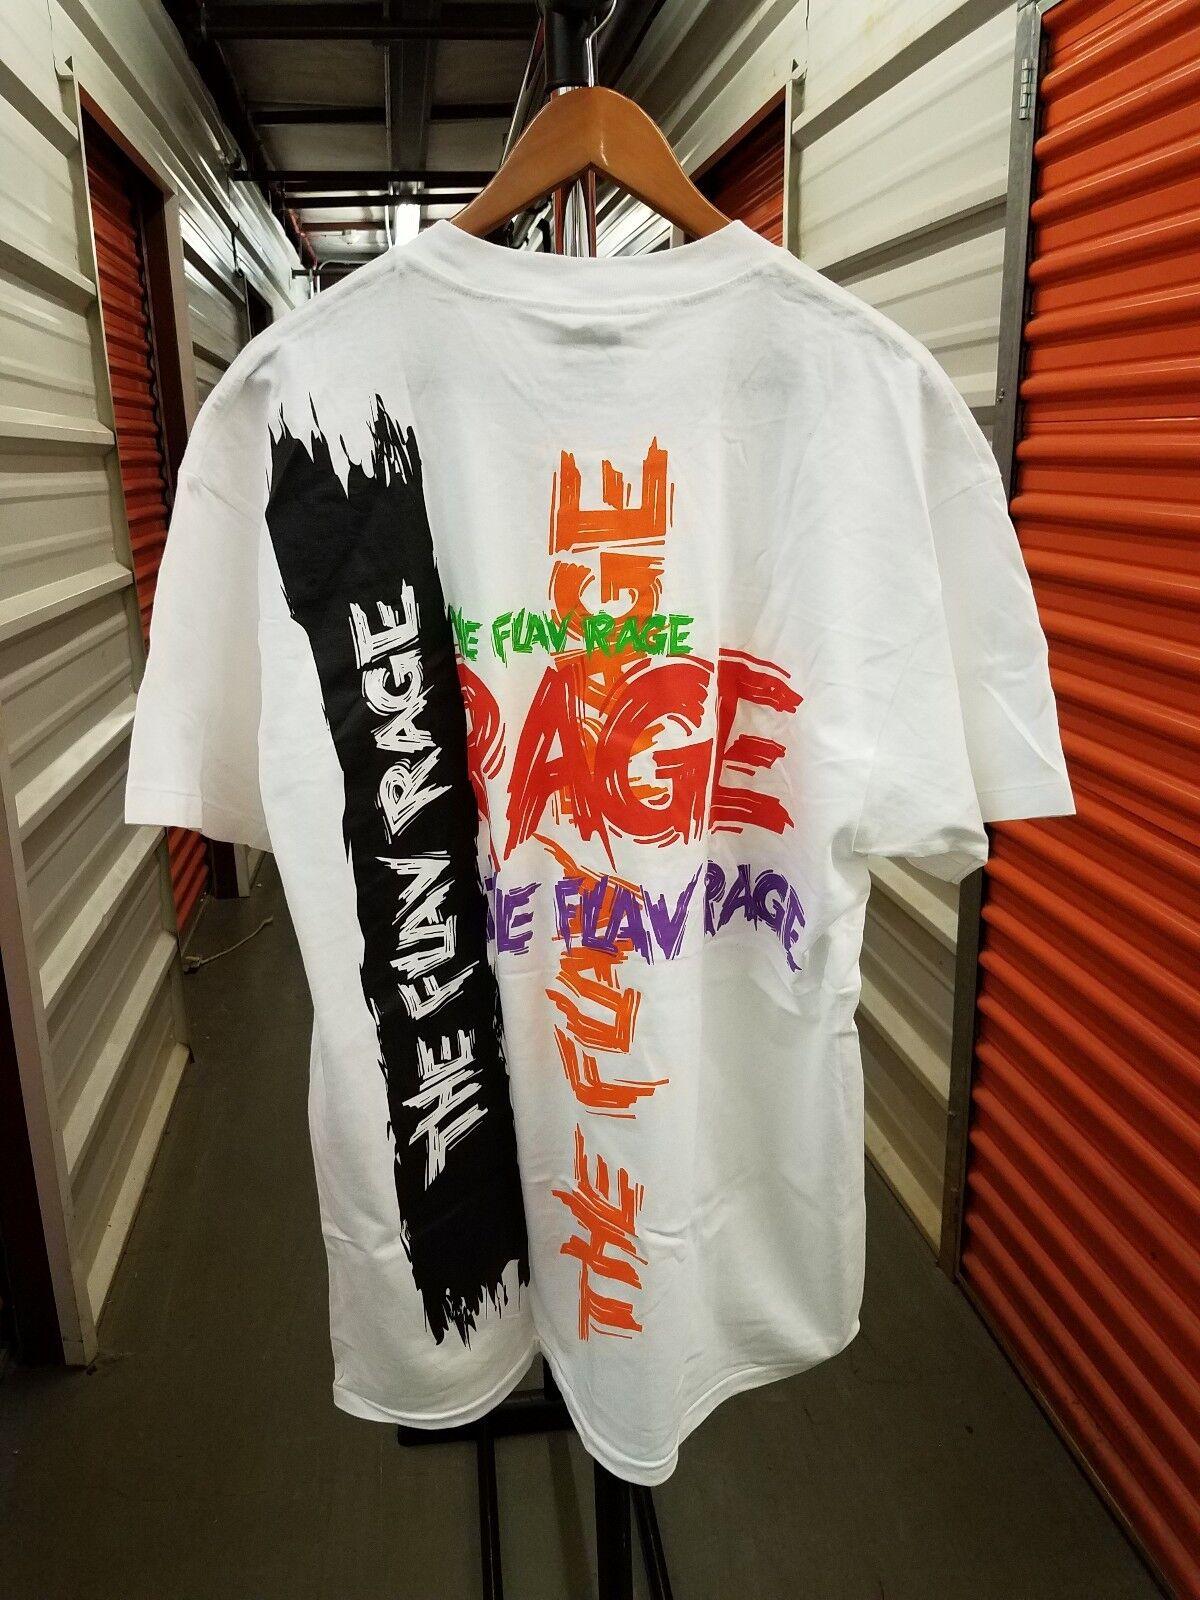 NWOT Vintage Minute Maid Sodas PROMO  The Flav Rage  White Graphic Shirt XL RARE